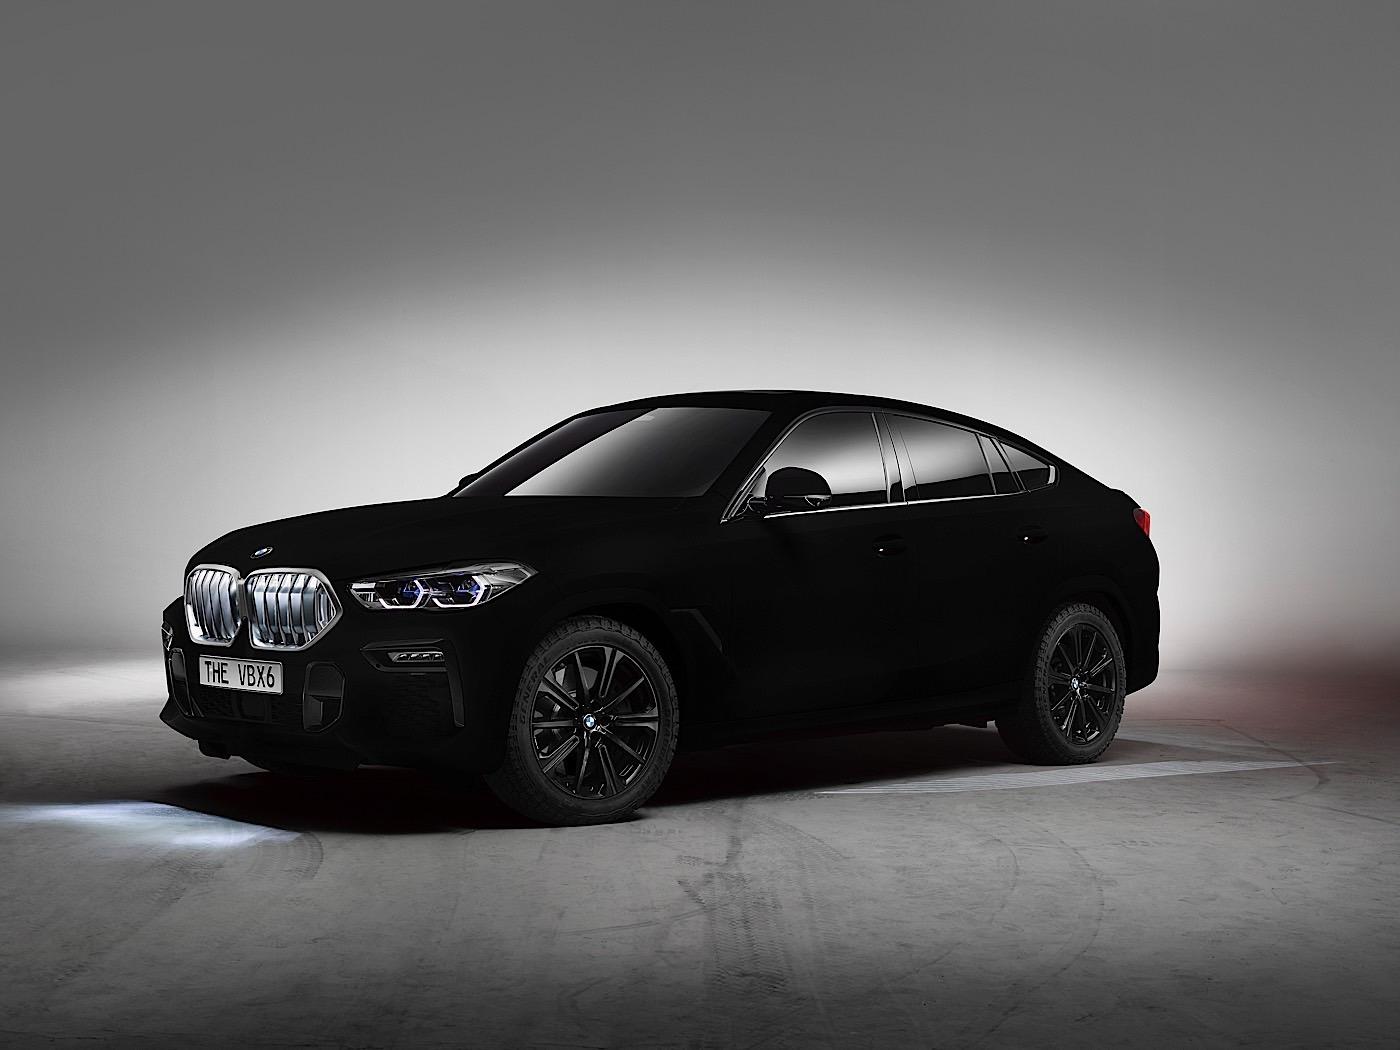 Vantablack paint is so black, this 2020 BMW X6 looks two-dimensional